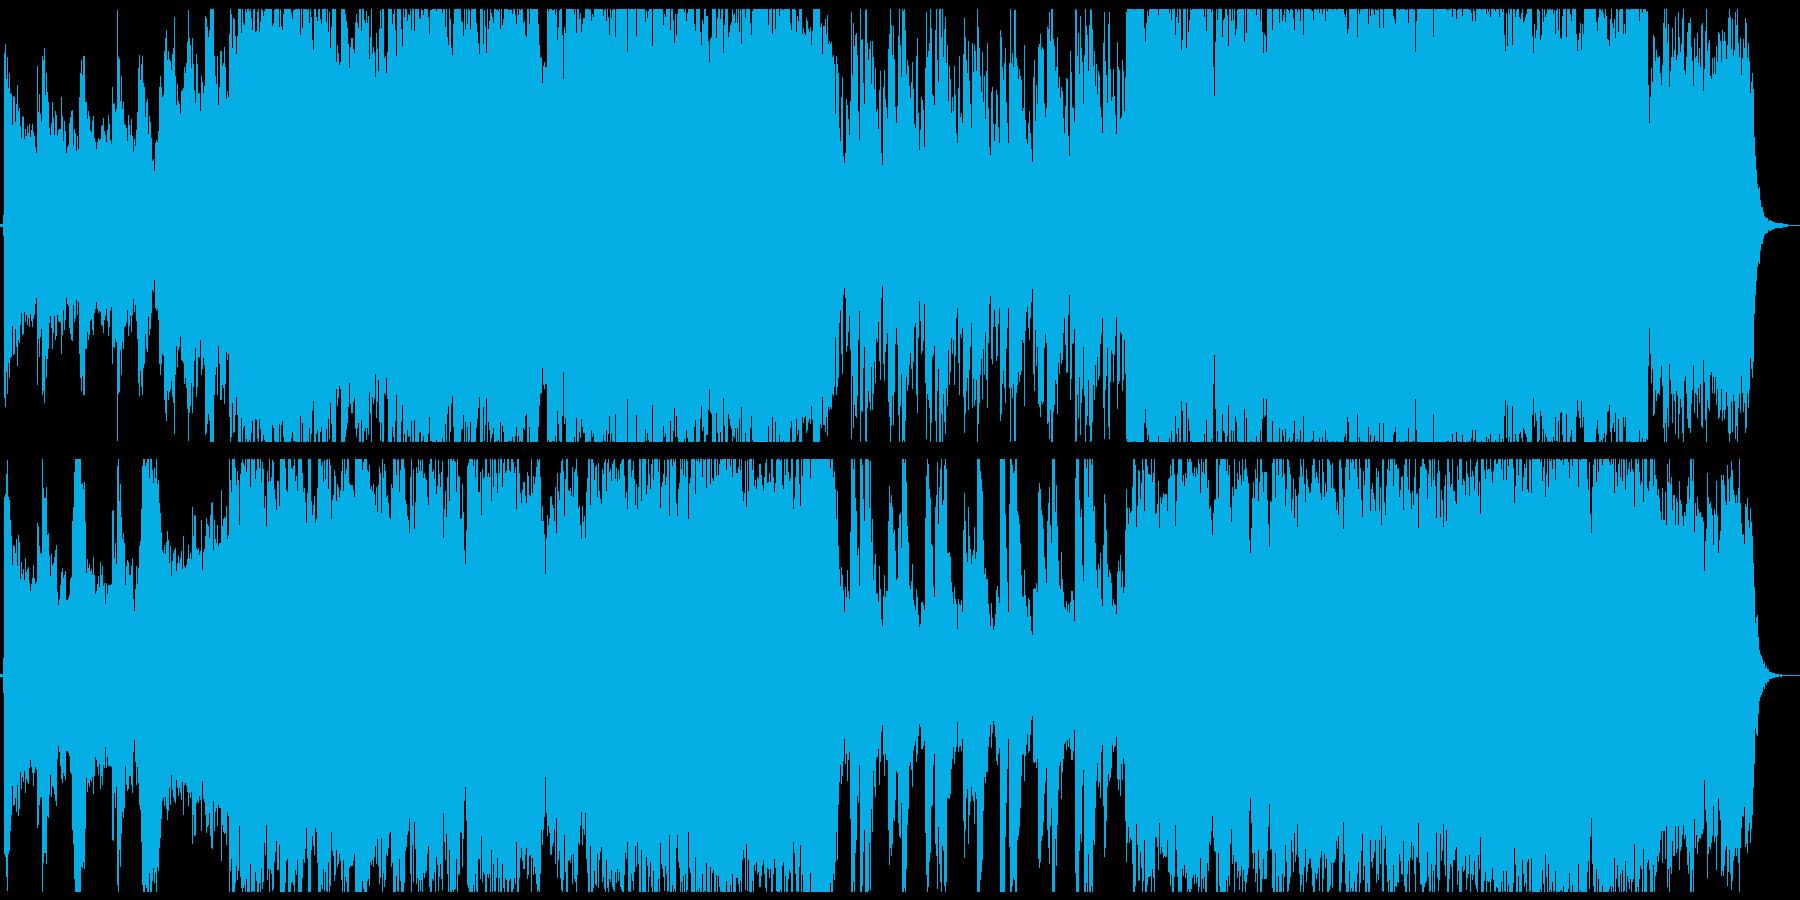 RPGのオープニングのような楽曲の再生済みの波形